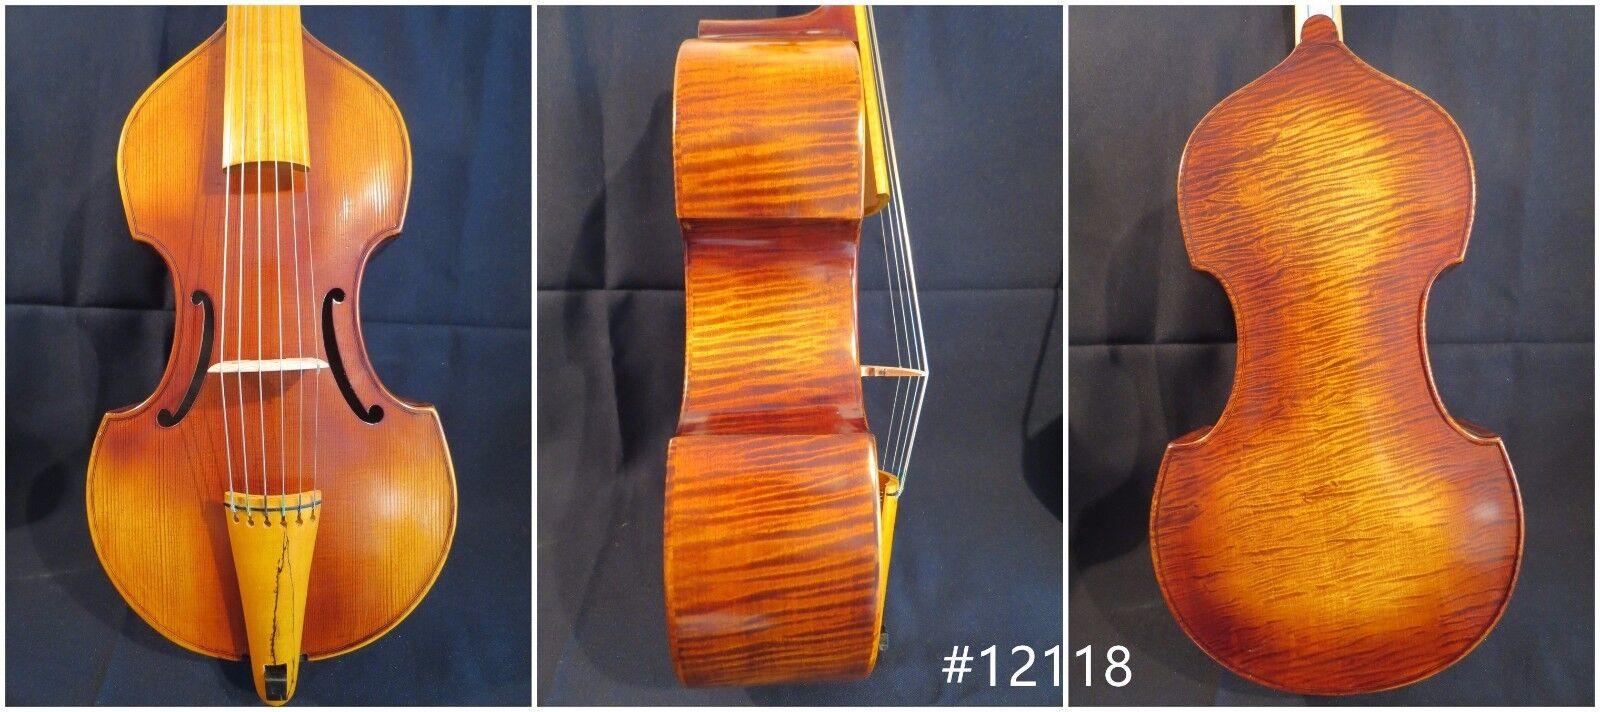 Hand made SONG Brand Maestro 6 strings 16  Trebles lila da gamba   12118